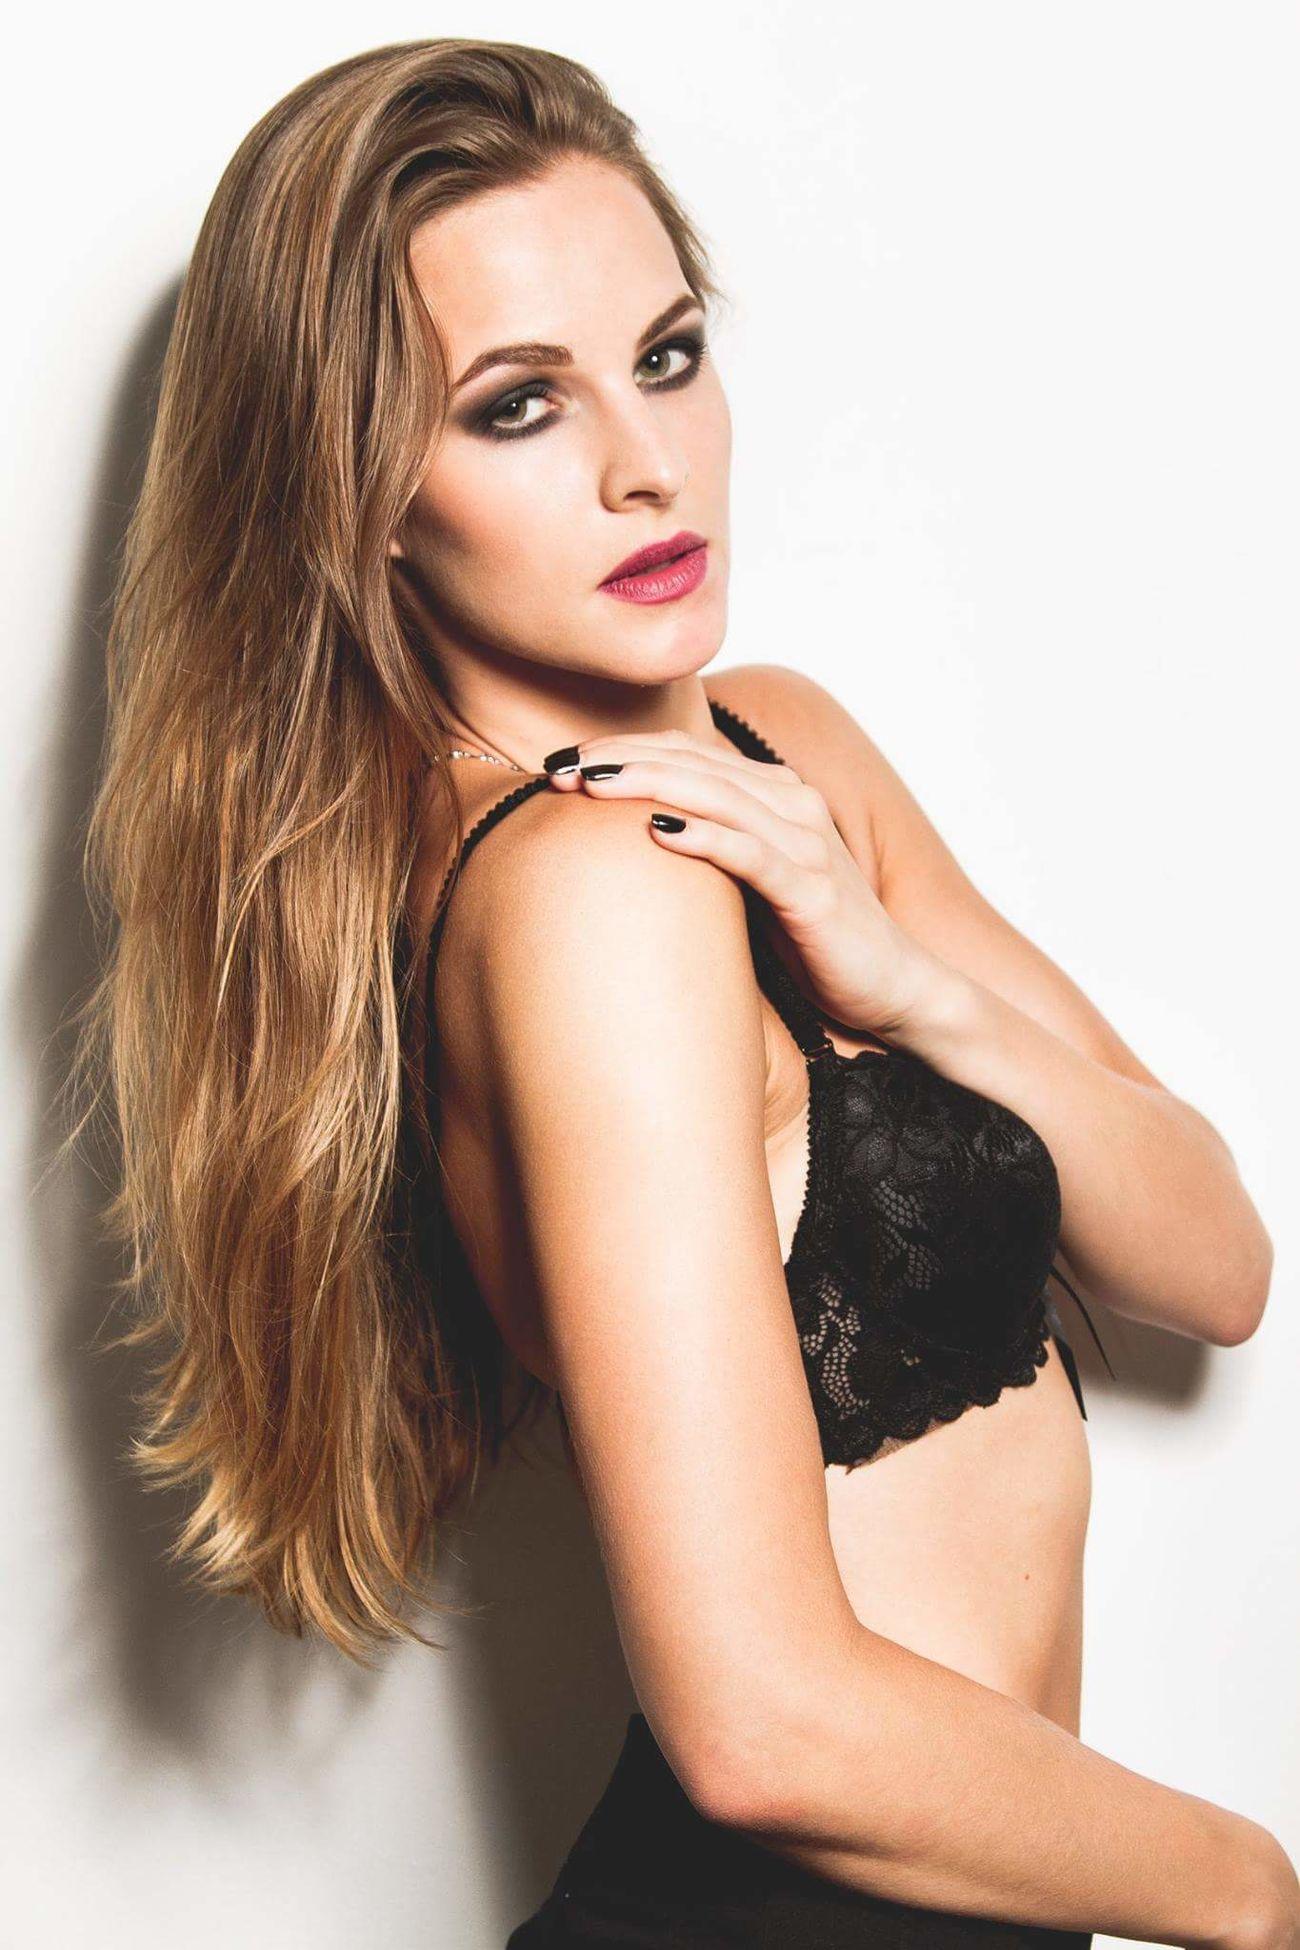 Glamour Makeup Makeupartist Beauty Lingerie Bra Elegant Sensuality Canon